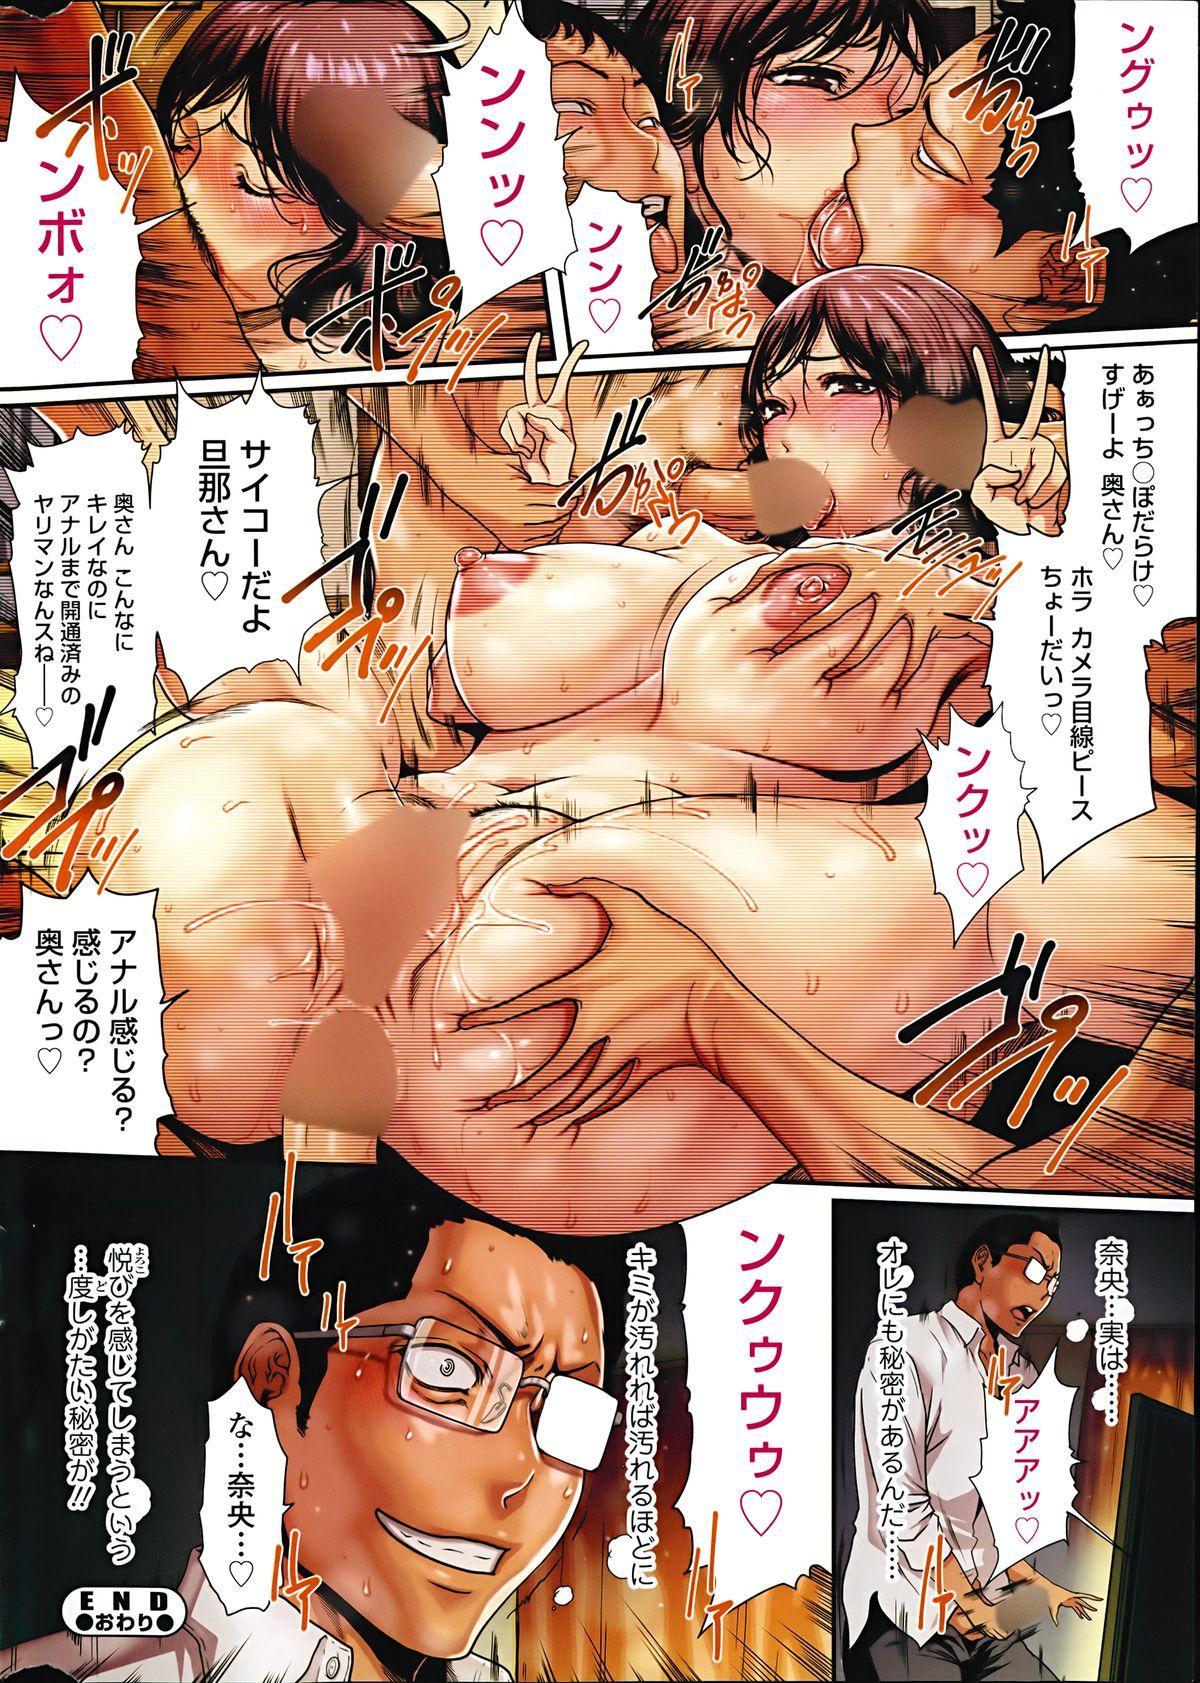 COMIC SIGMA 2014-09 Vol.81 9